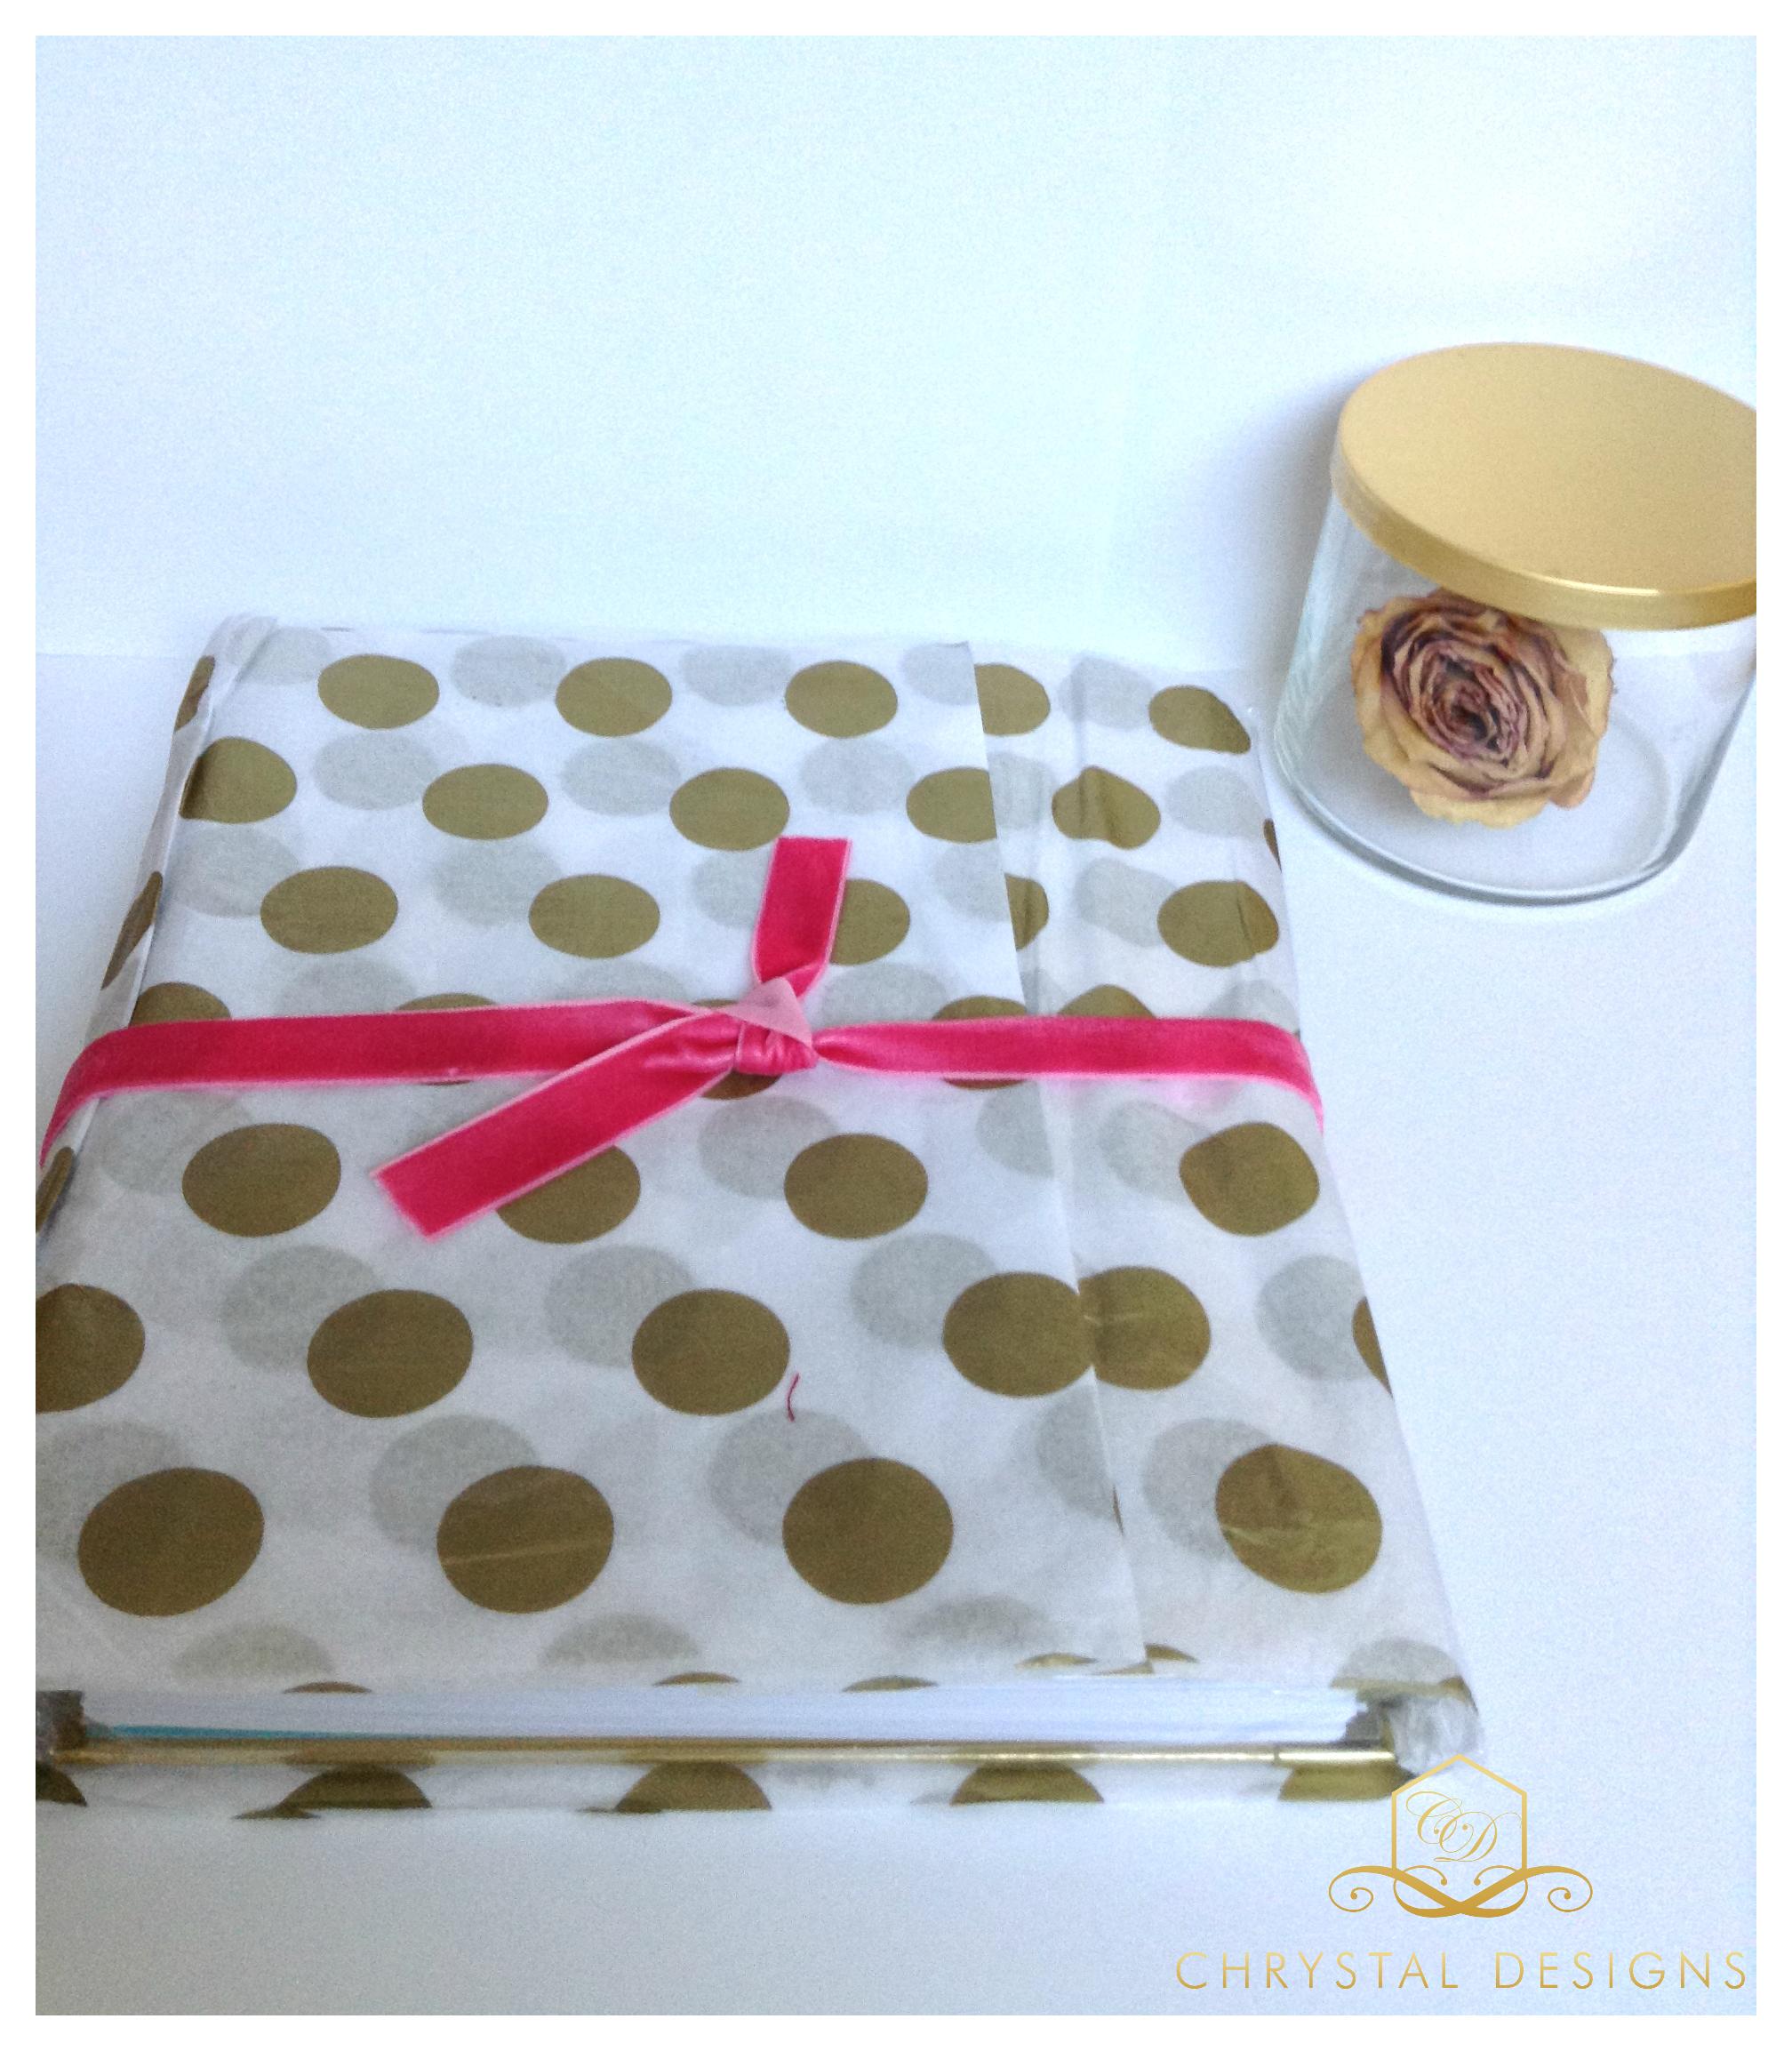 Day-Designer-Whitney-English-First-Impression-Polka-Dot-Wrap